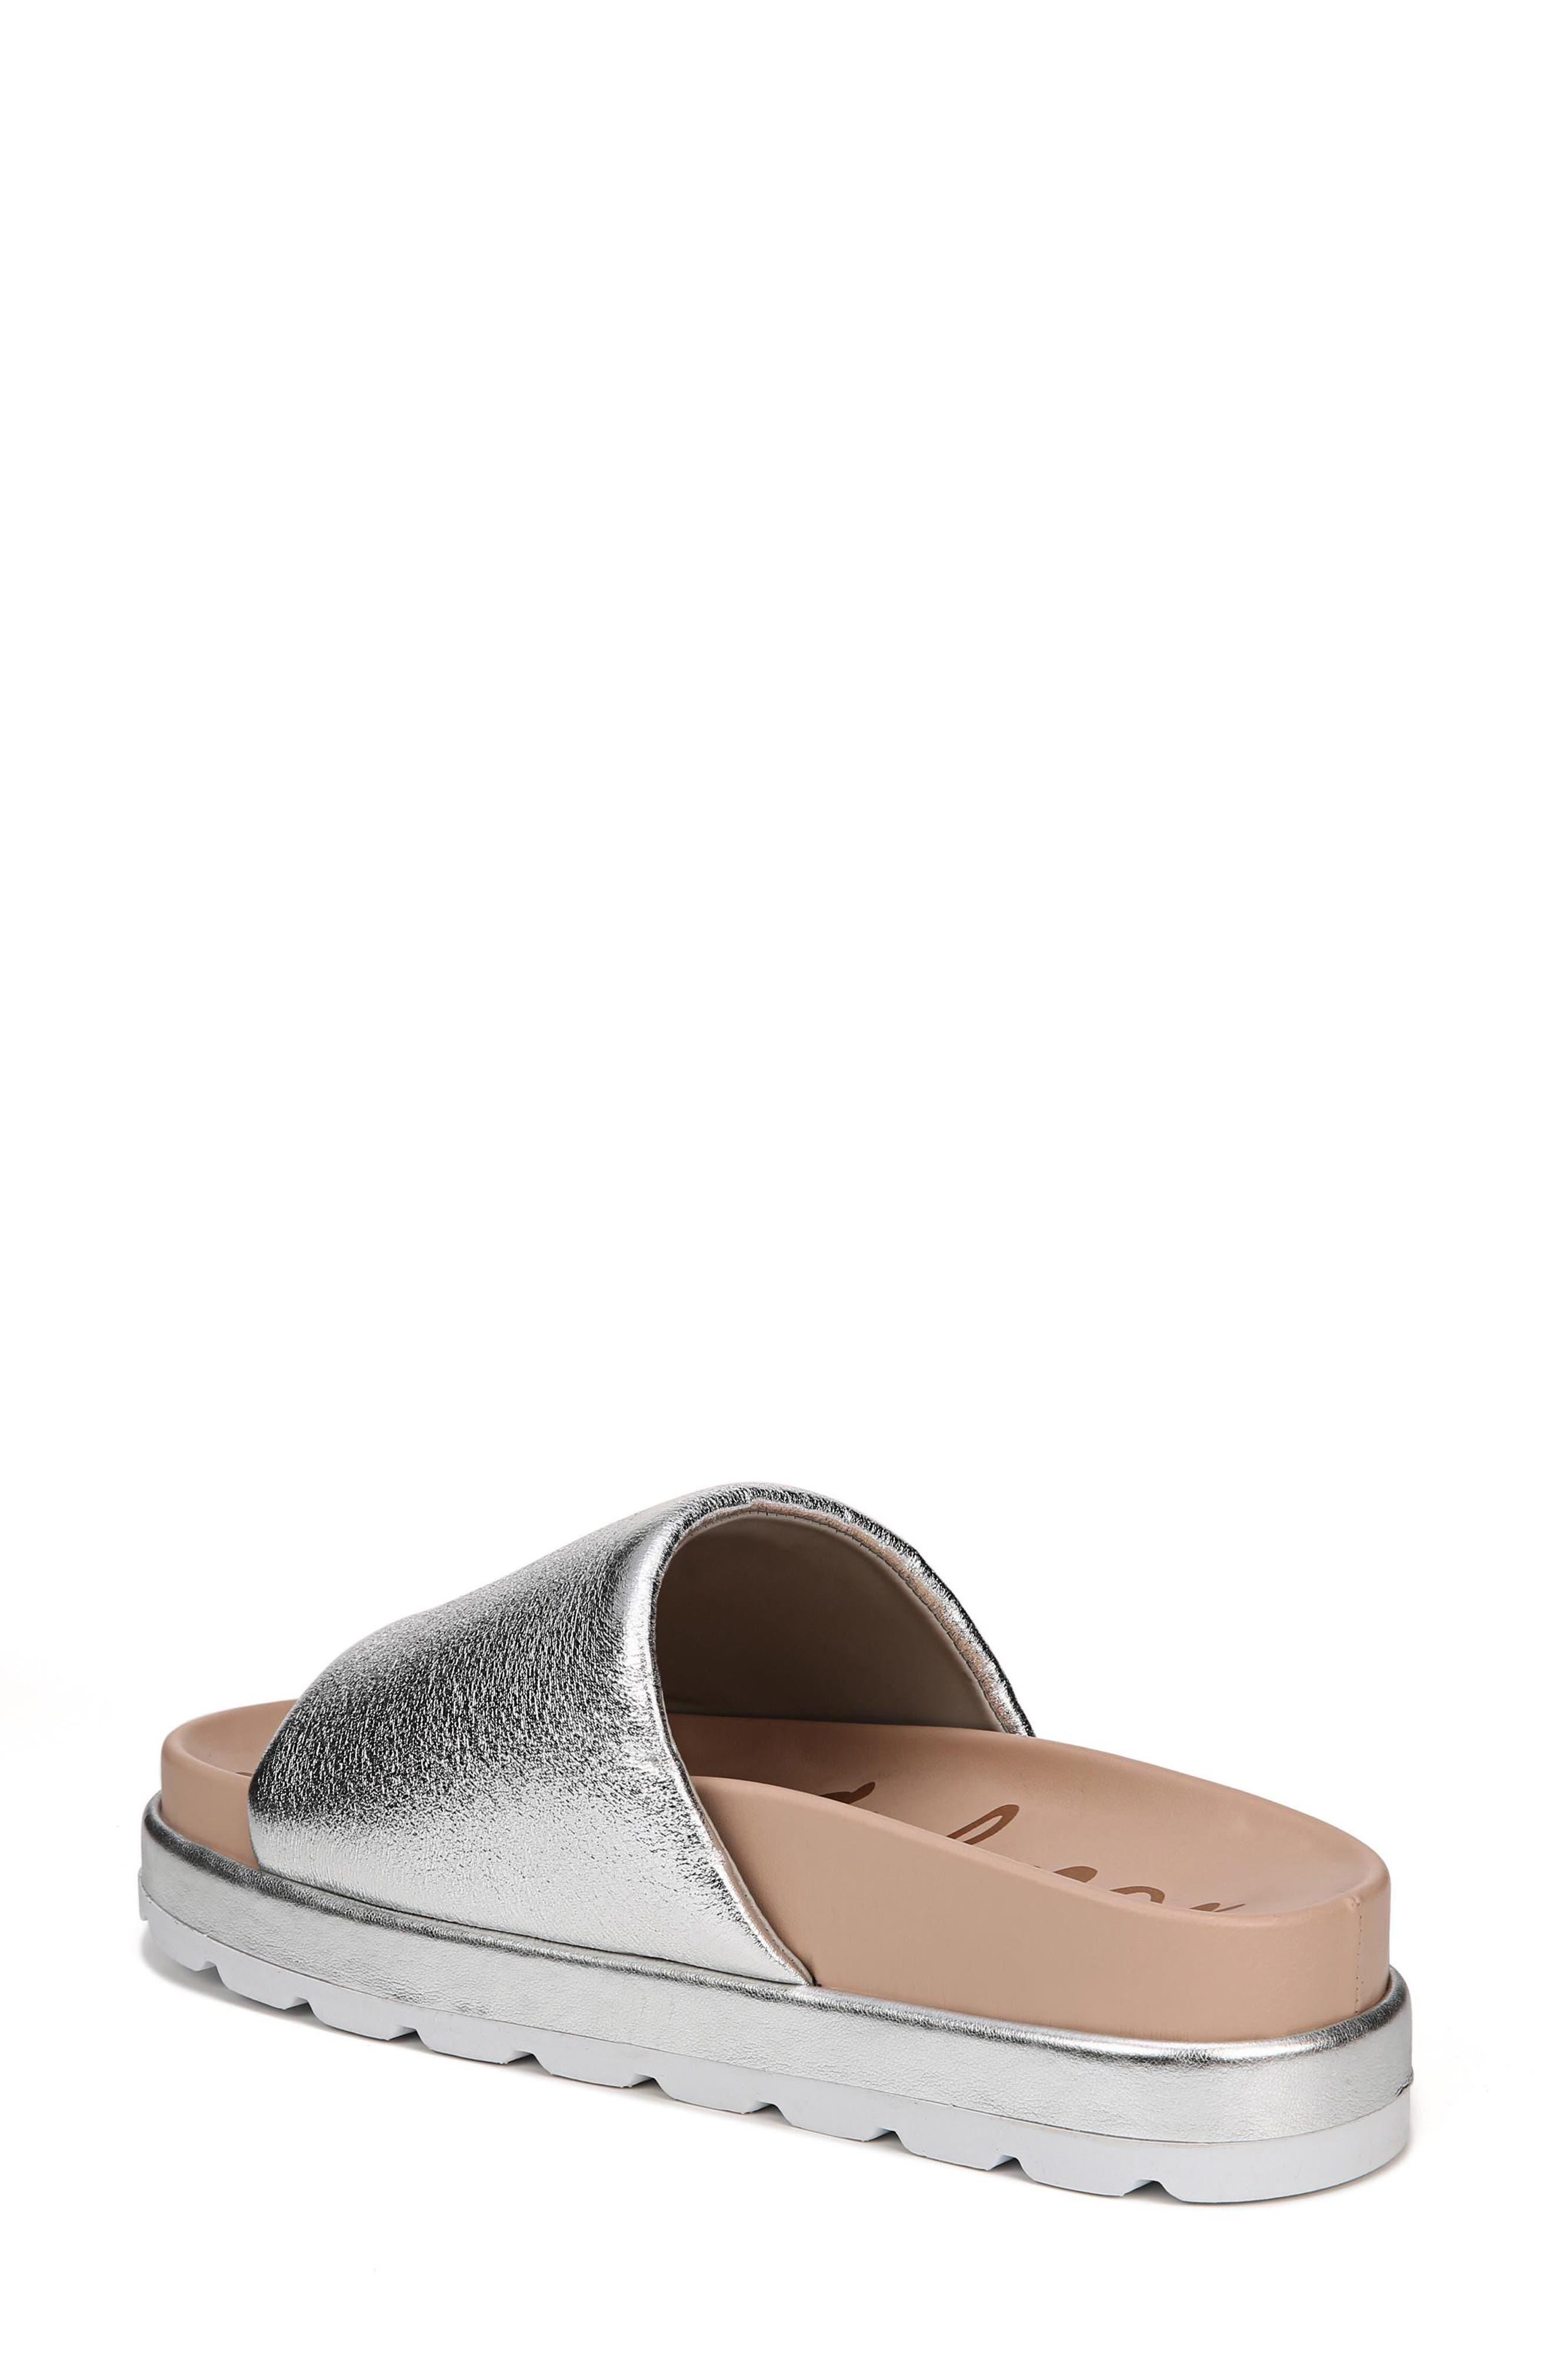 Shaye Slide Sandal,                             Alternate thumbnail 3, color,                             Soft Silver Metallic Fabric